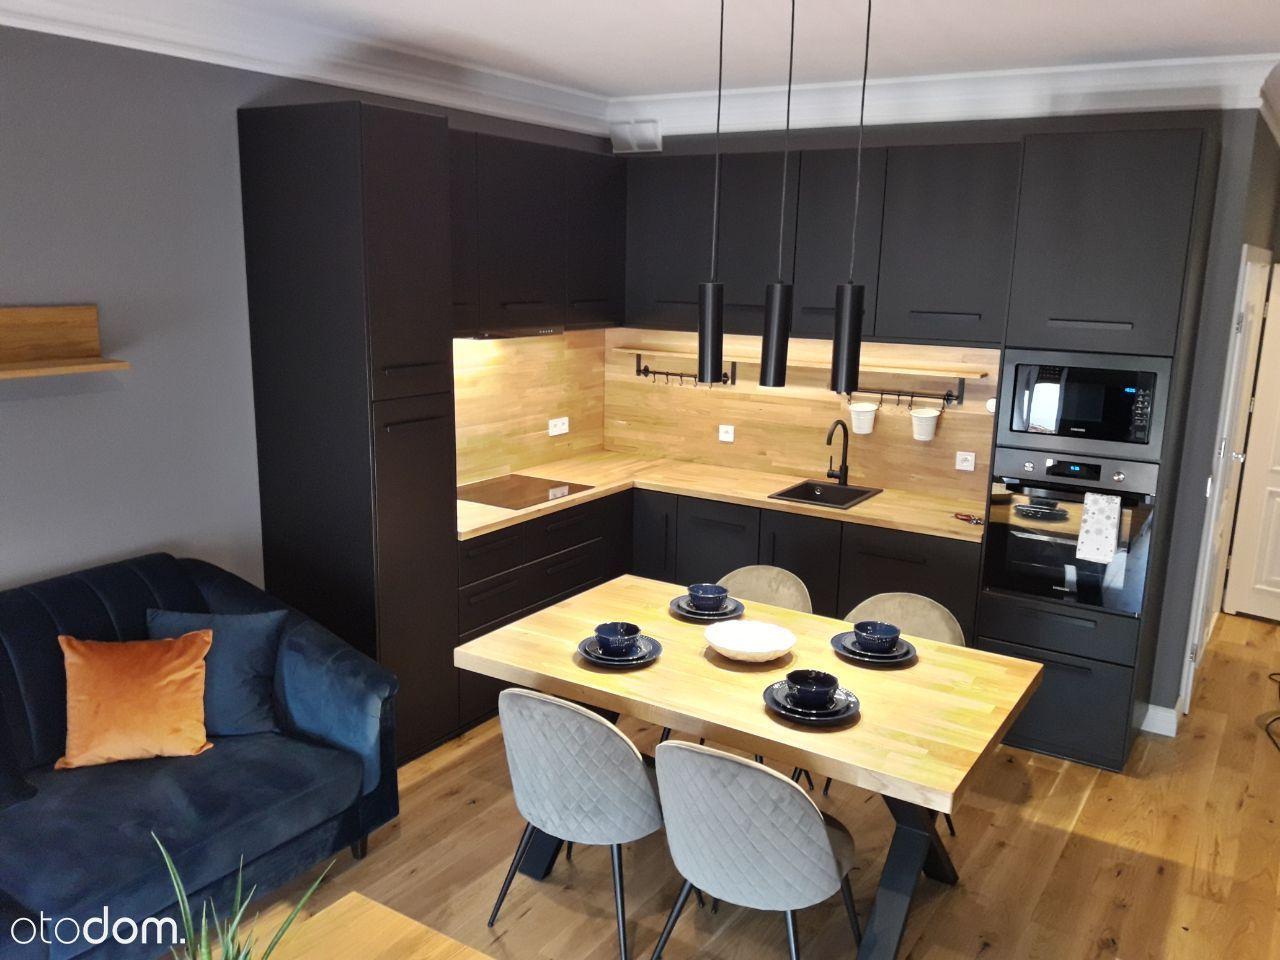 Apartament na Os.Bermudy